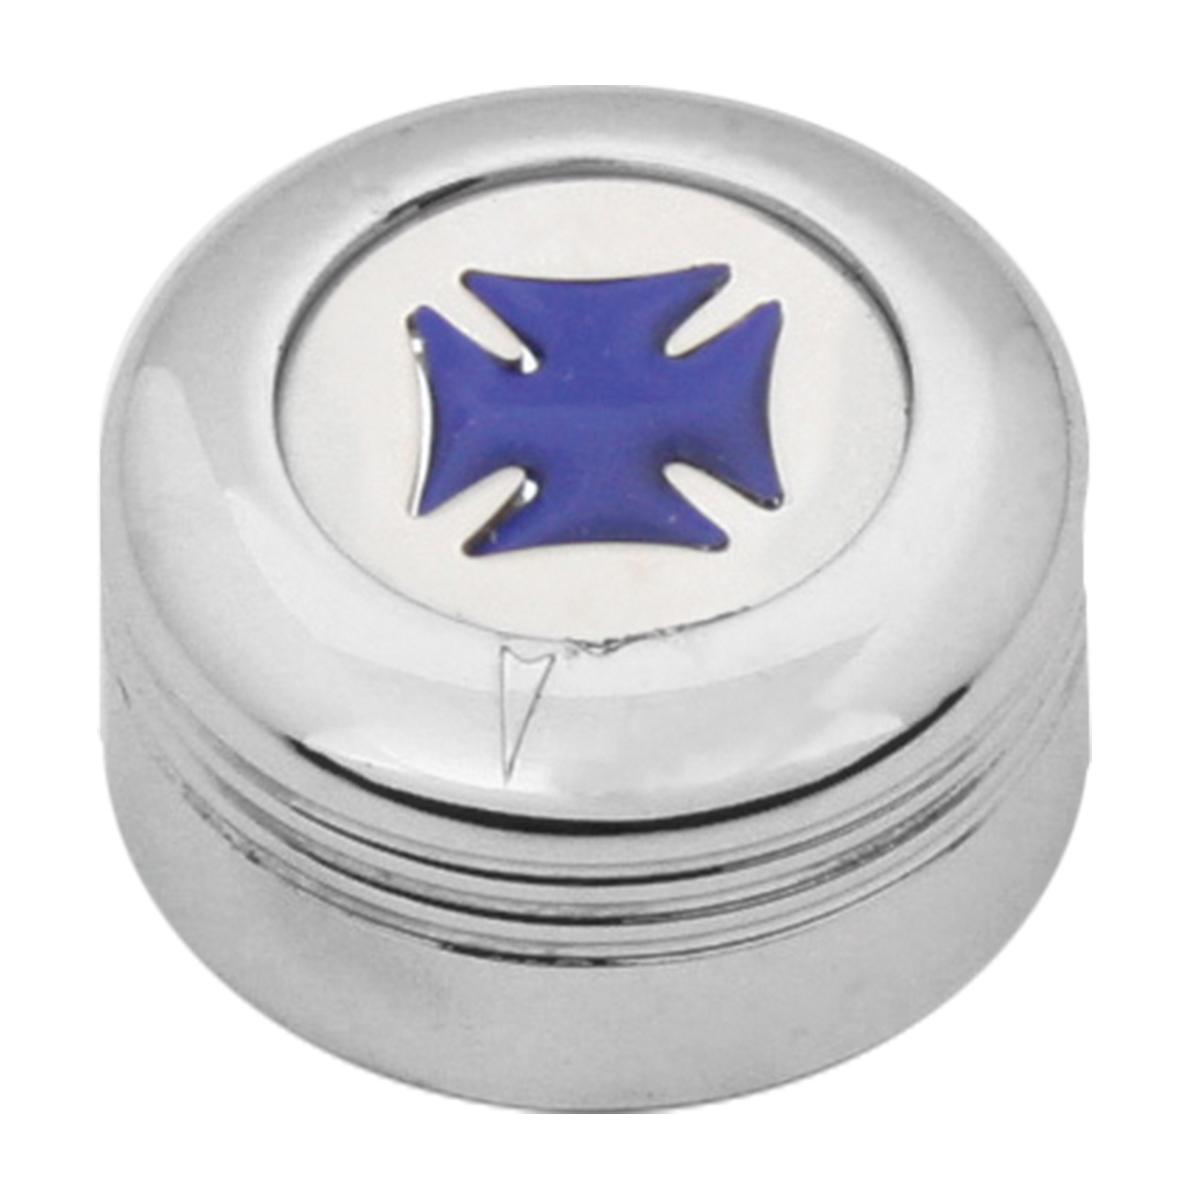 Chrome Plastic A/C Knob w/ Blue Iron Cross for Pete